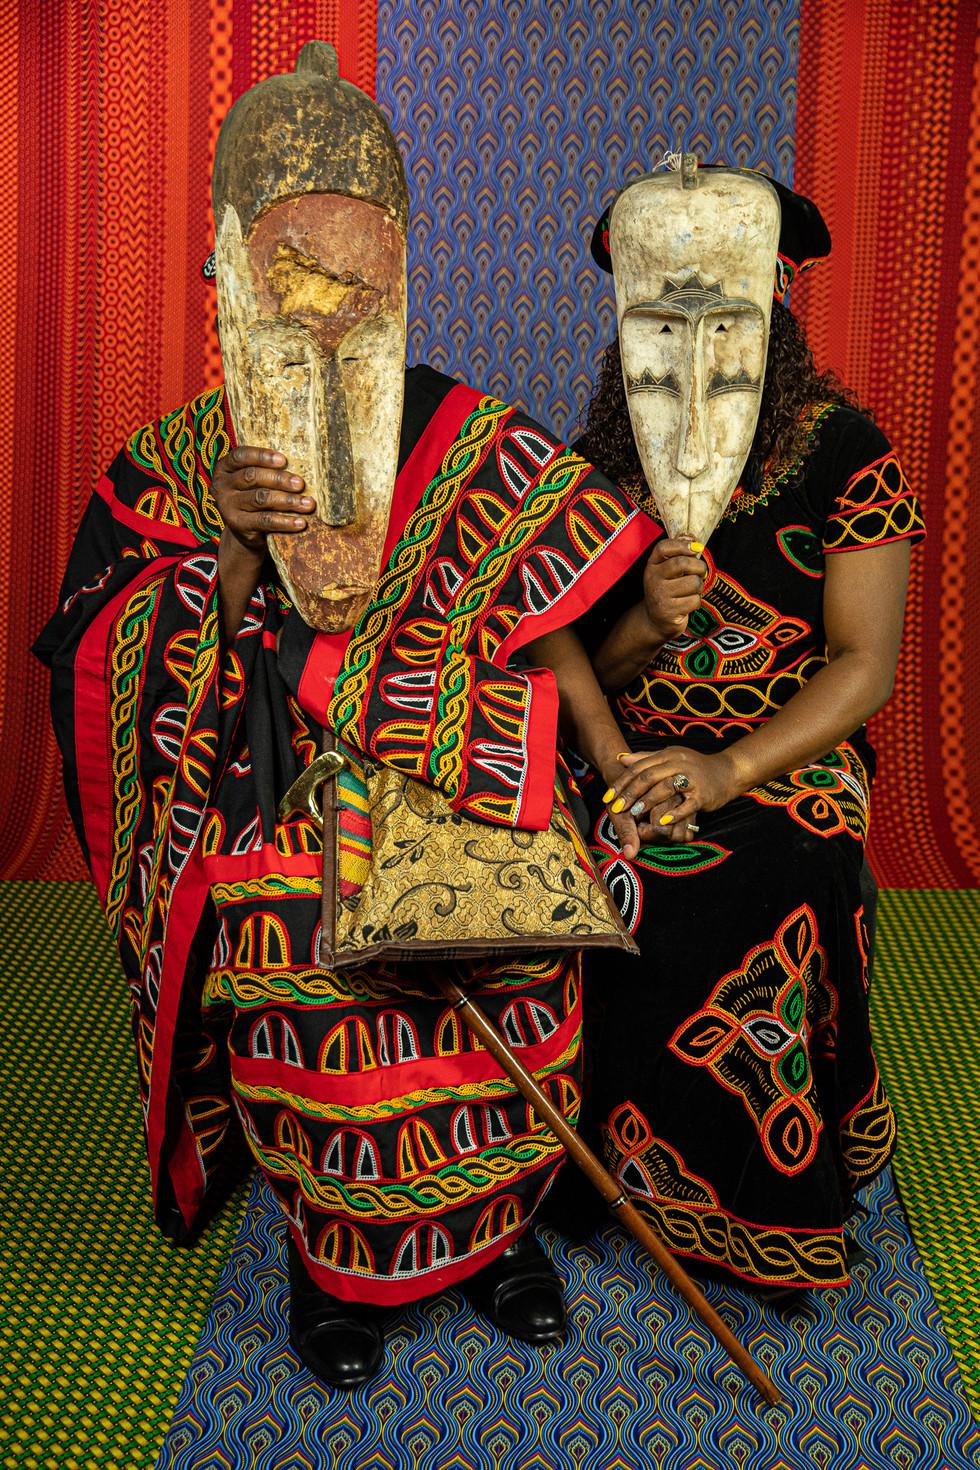 Cameroon_Web_-41.jpg